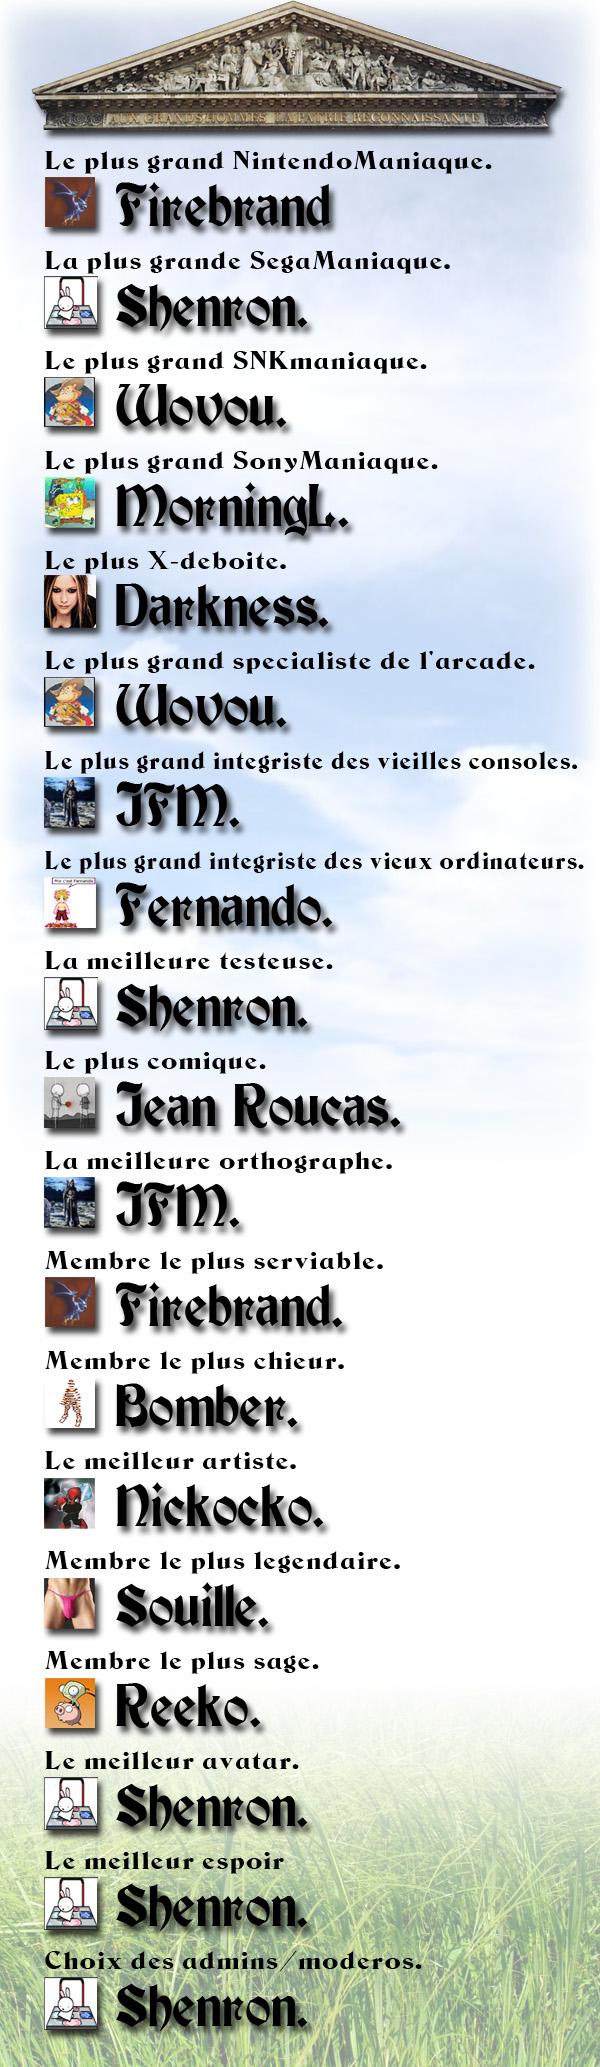 http://www.planetemu.net/php/articles/files/Image/zapier/planetars/2005.jpg